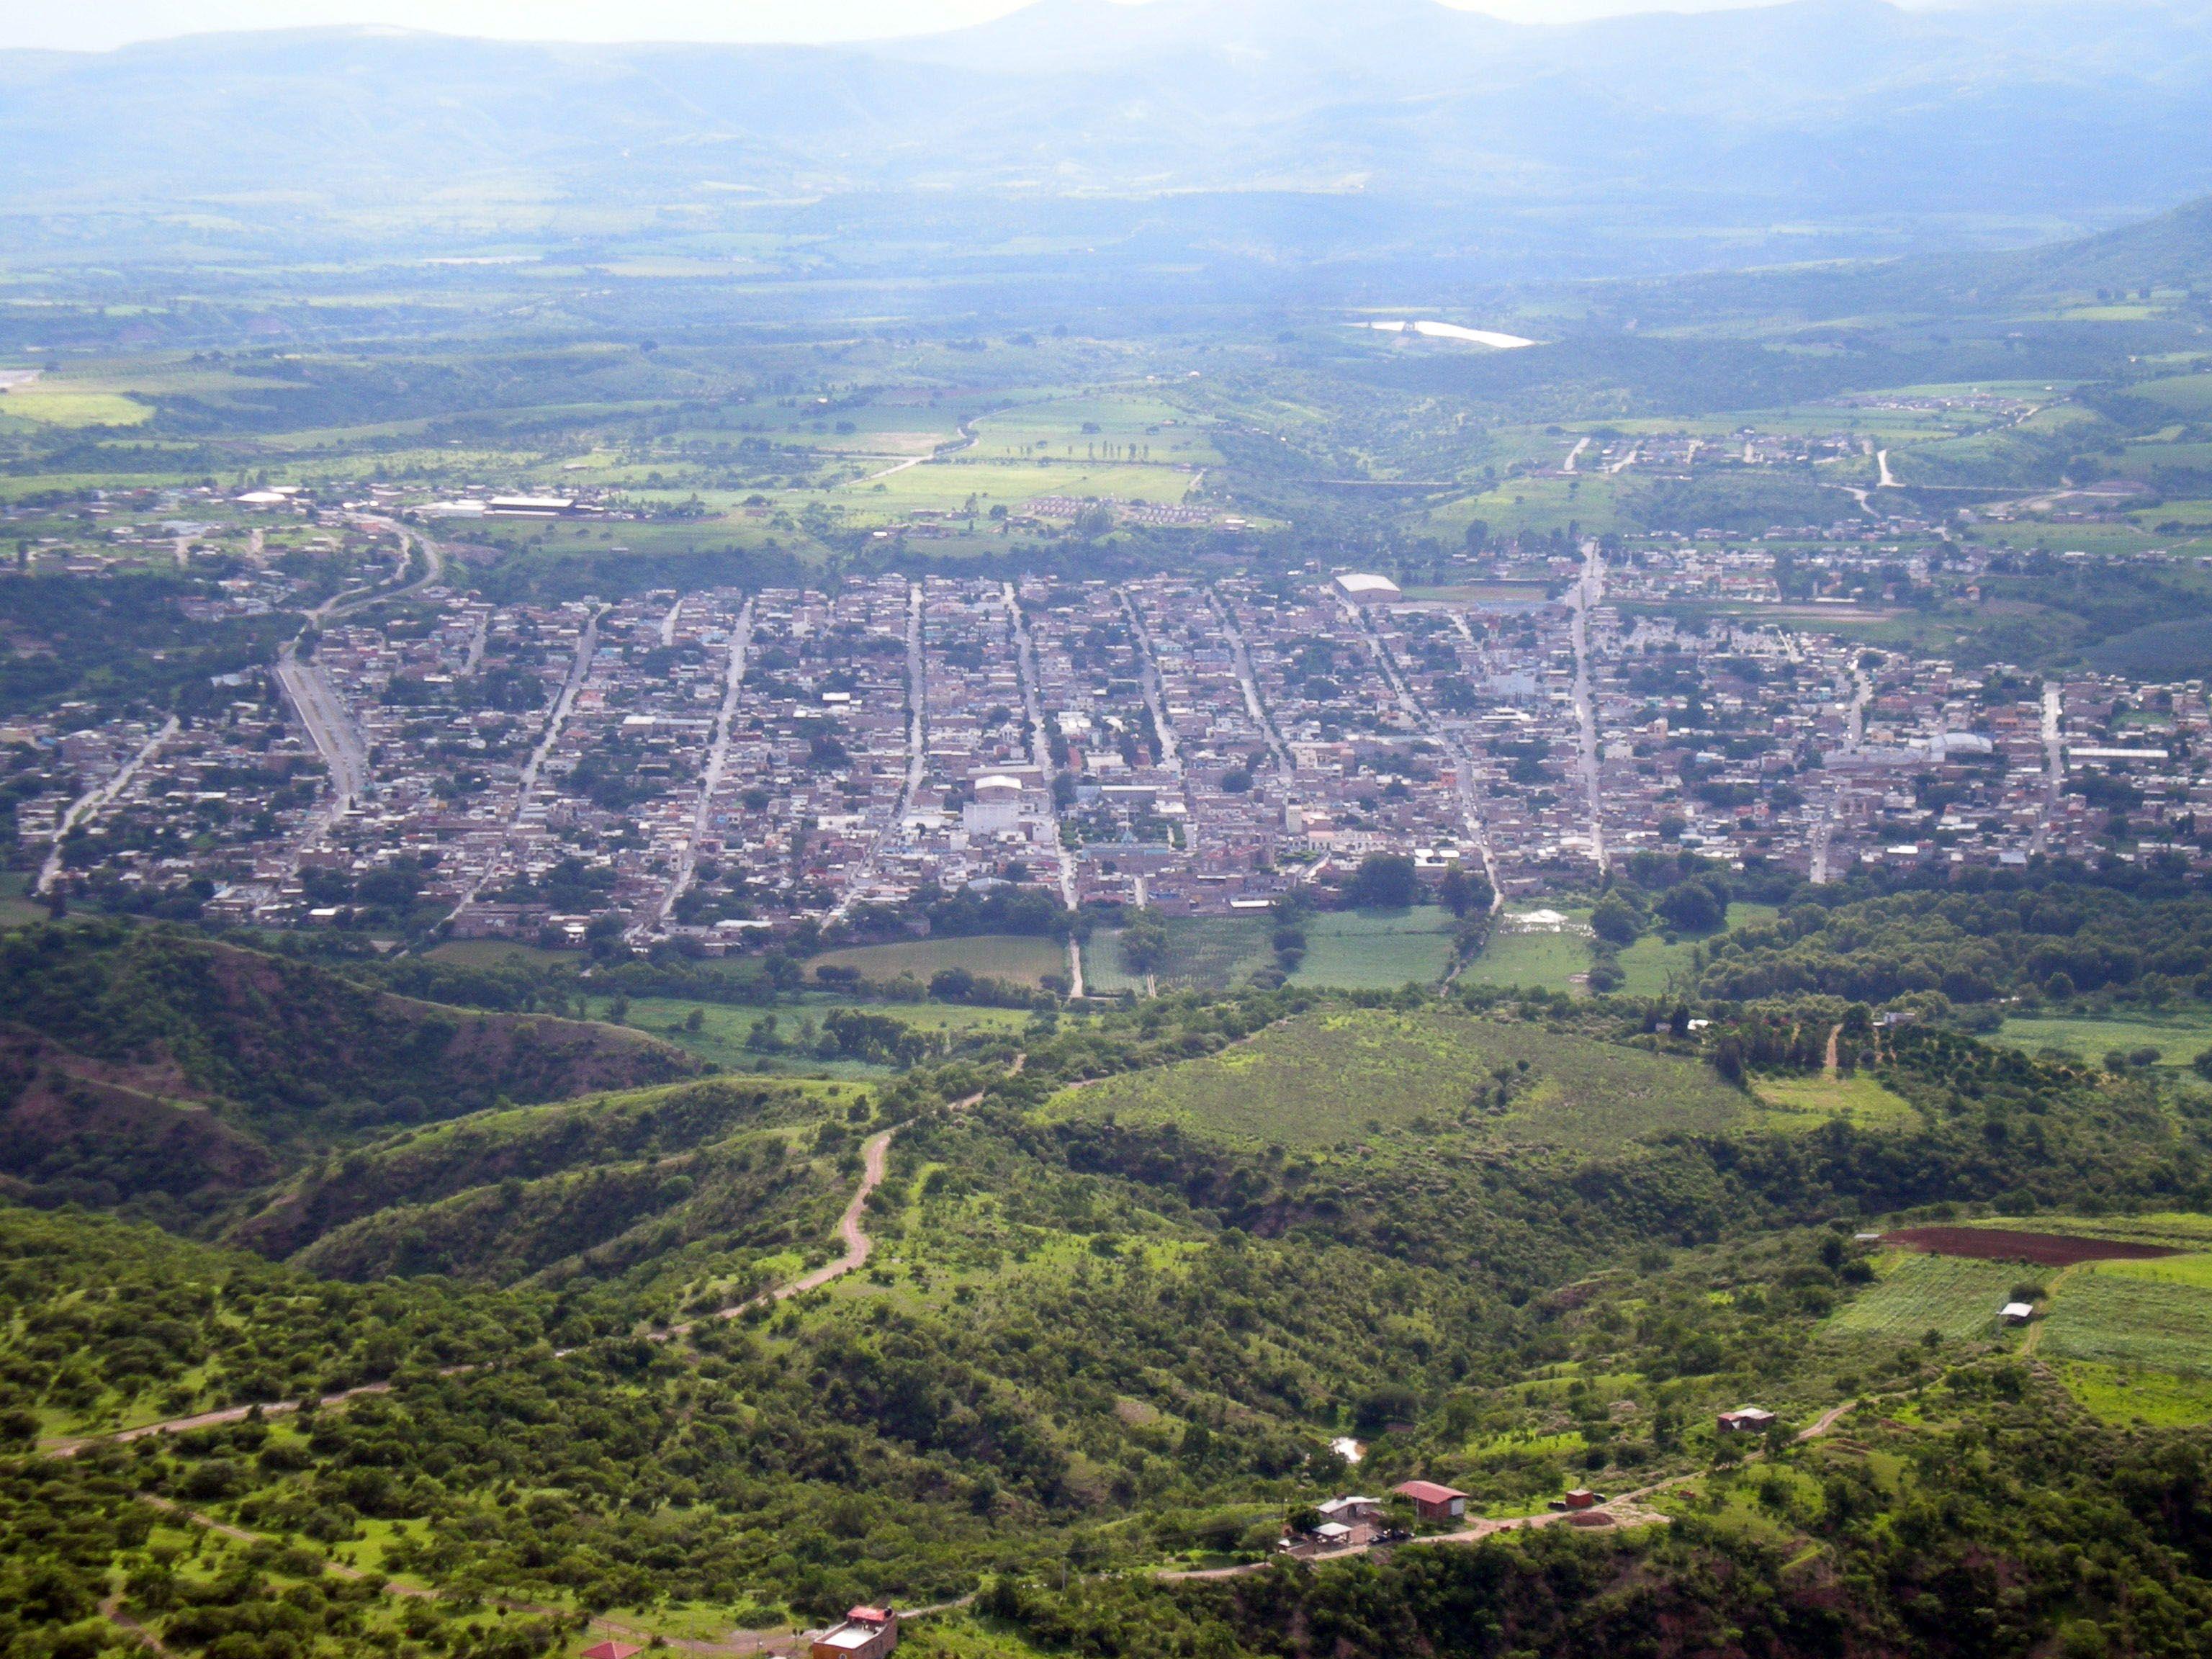 Jalpa Zacatecas México My Fathers Birthplace And The Most